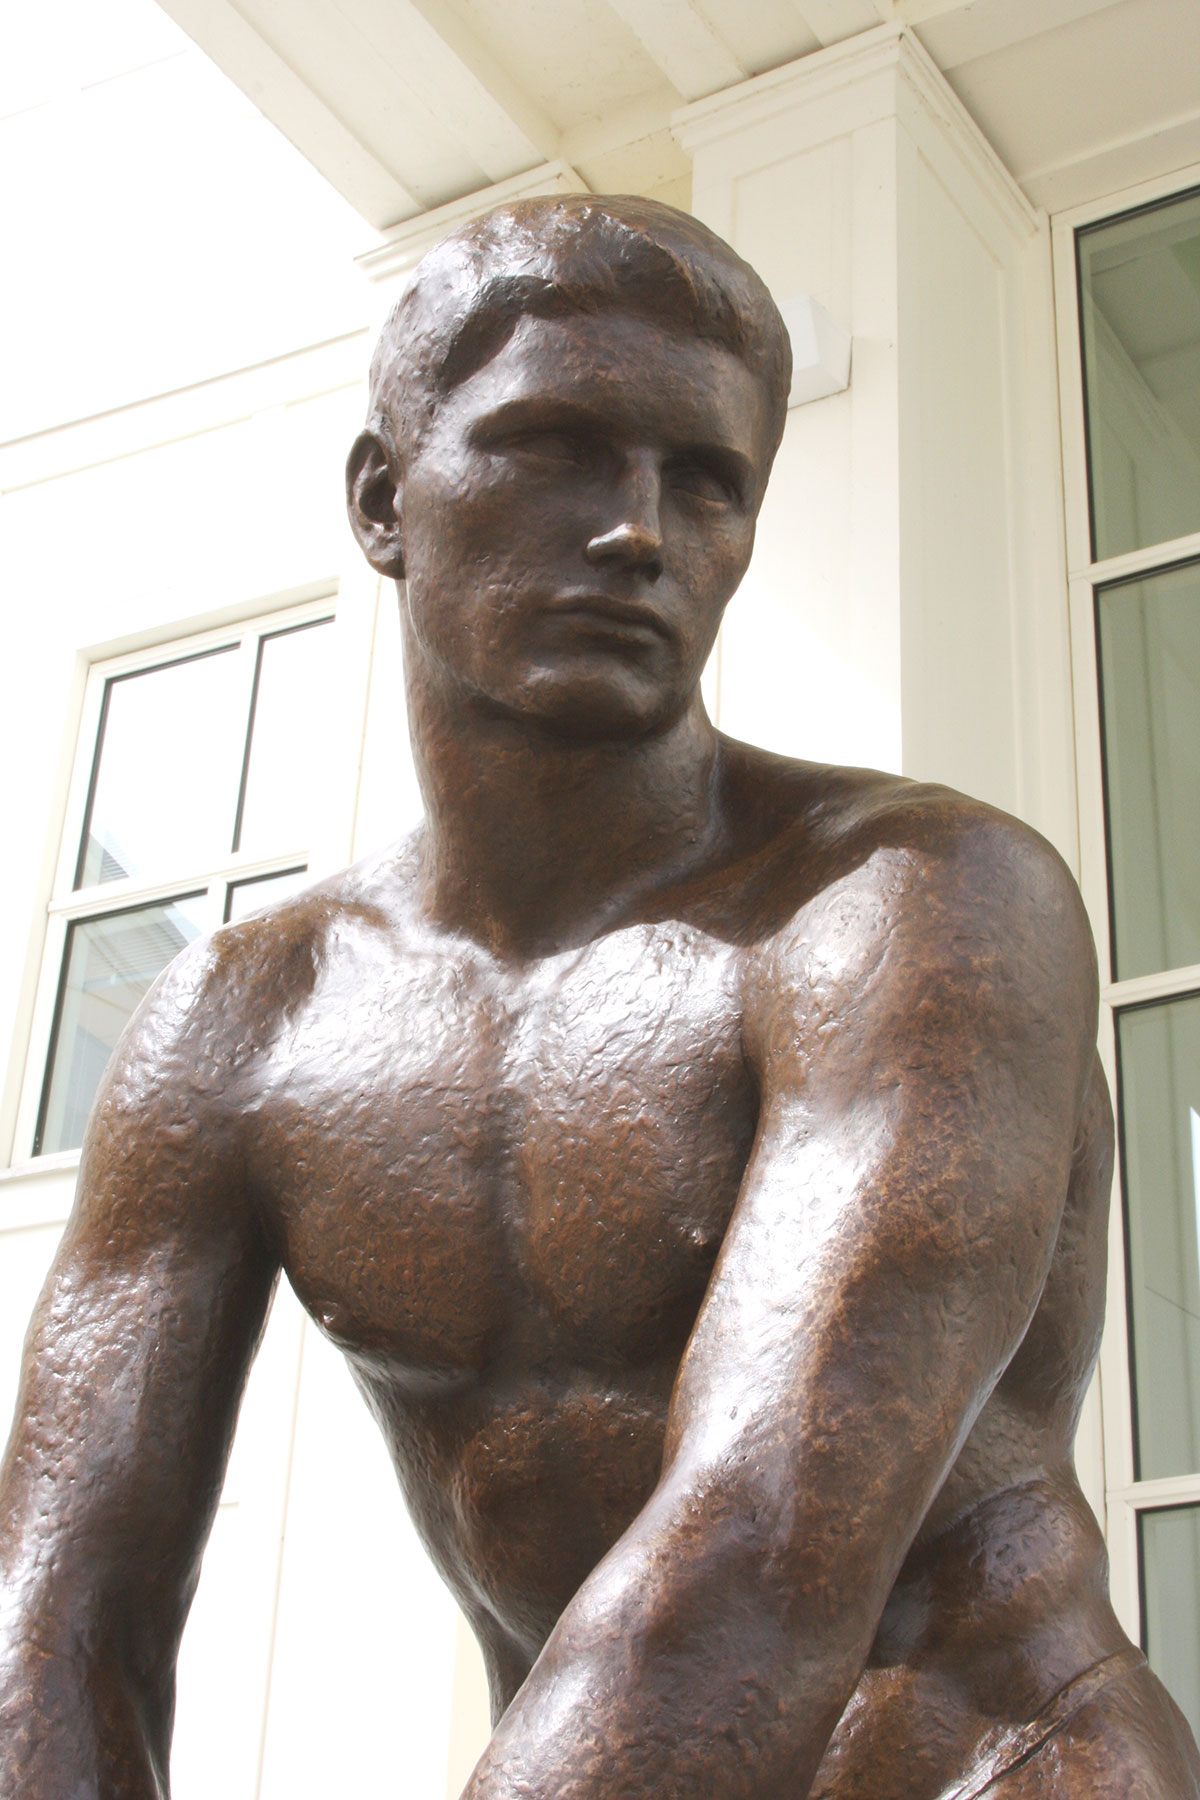 After: bronze sculpture after conservation treatment